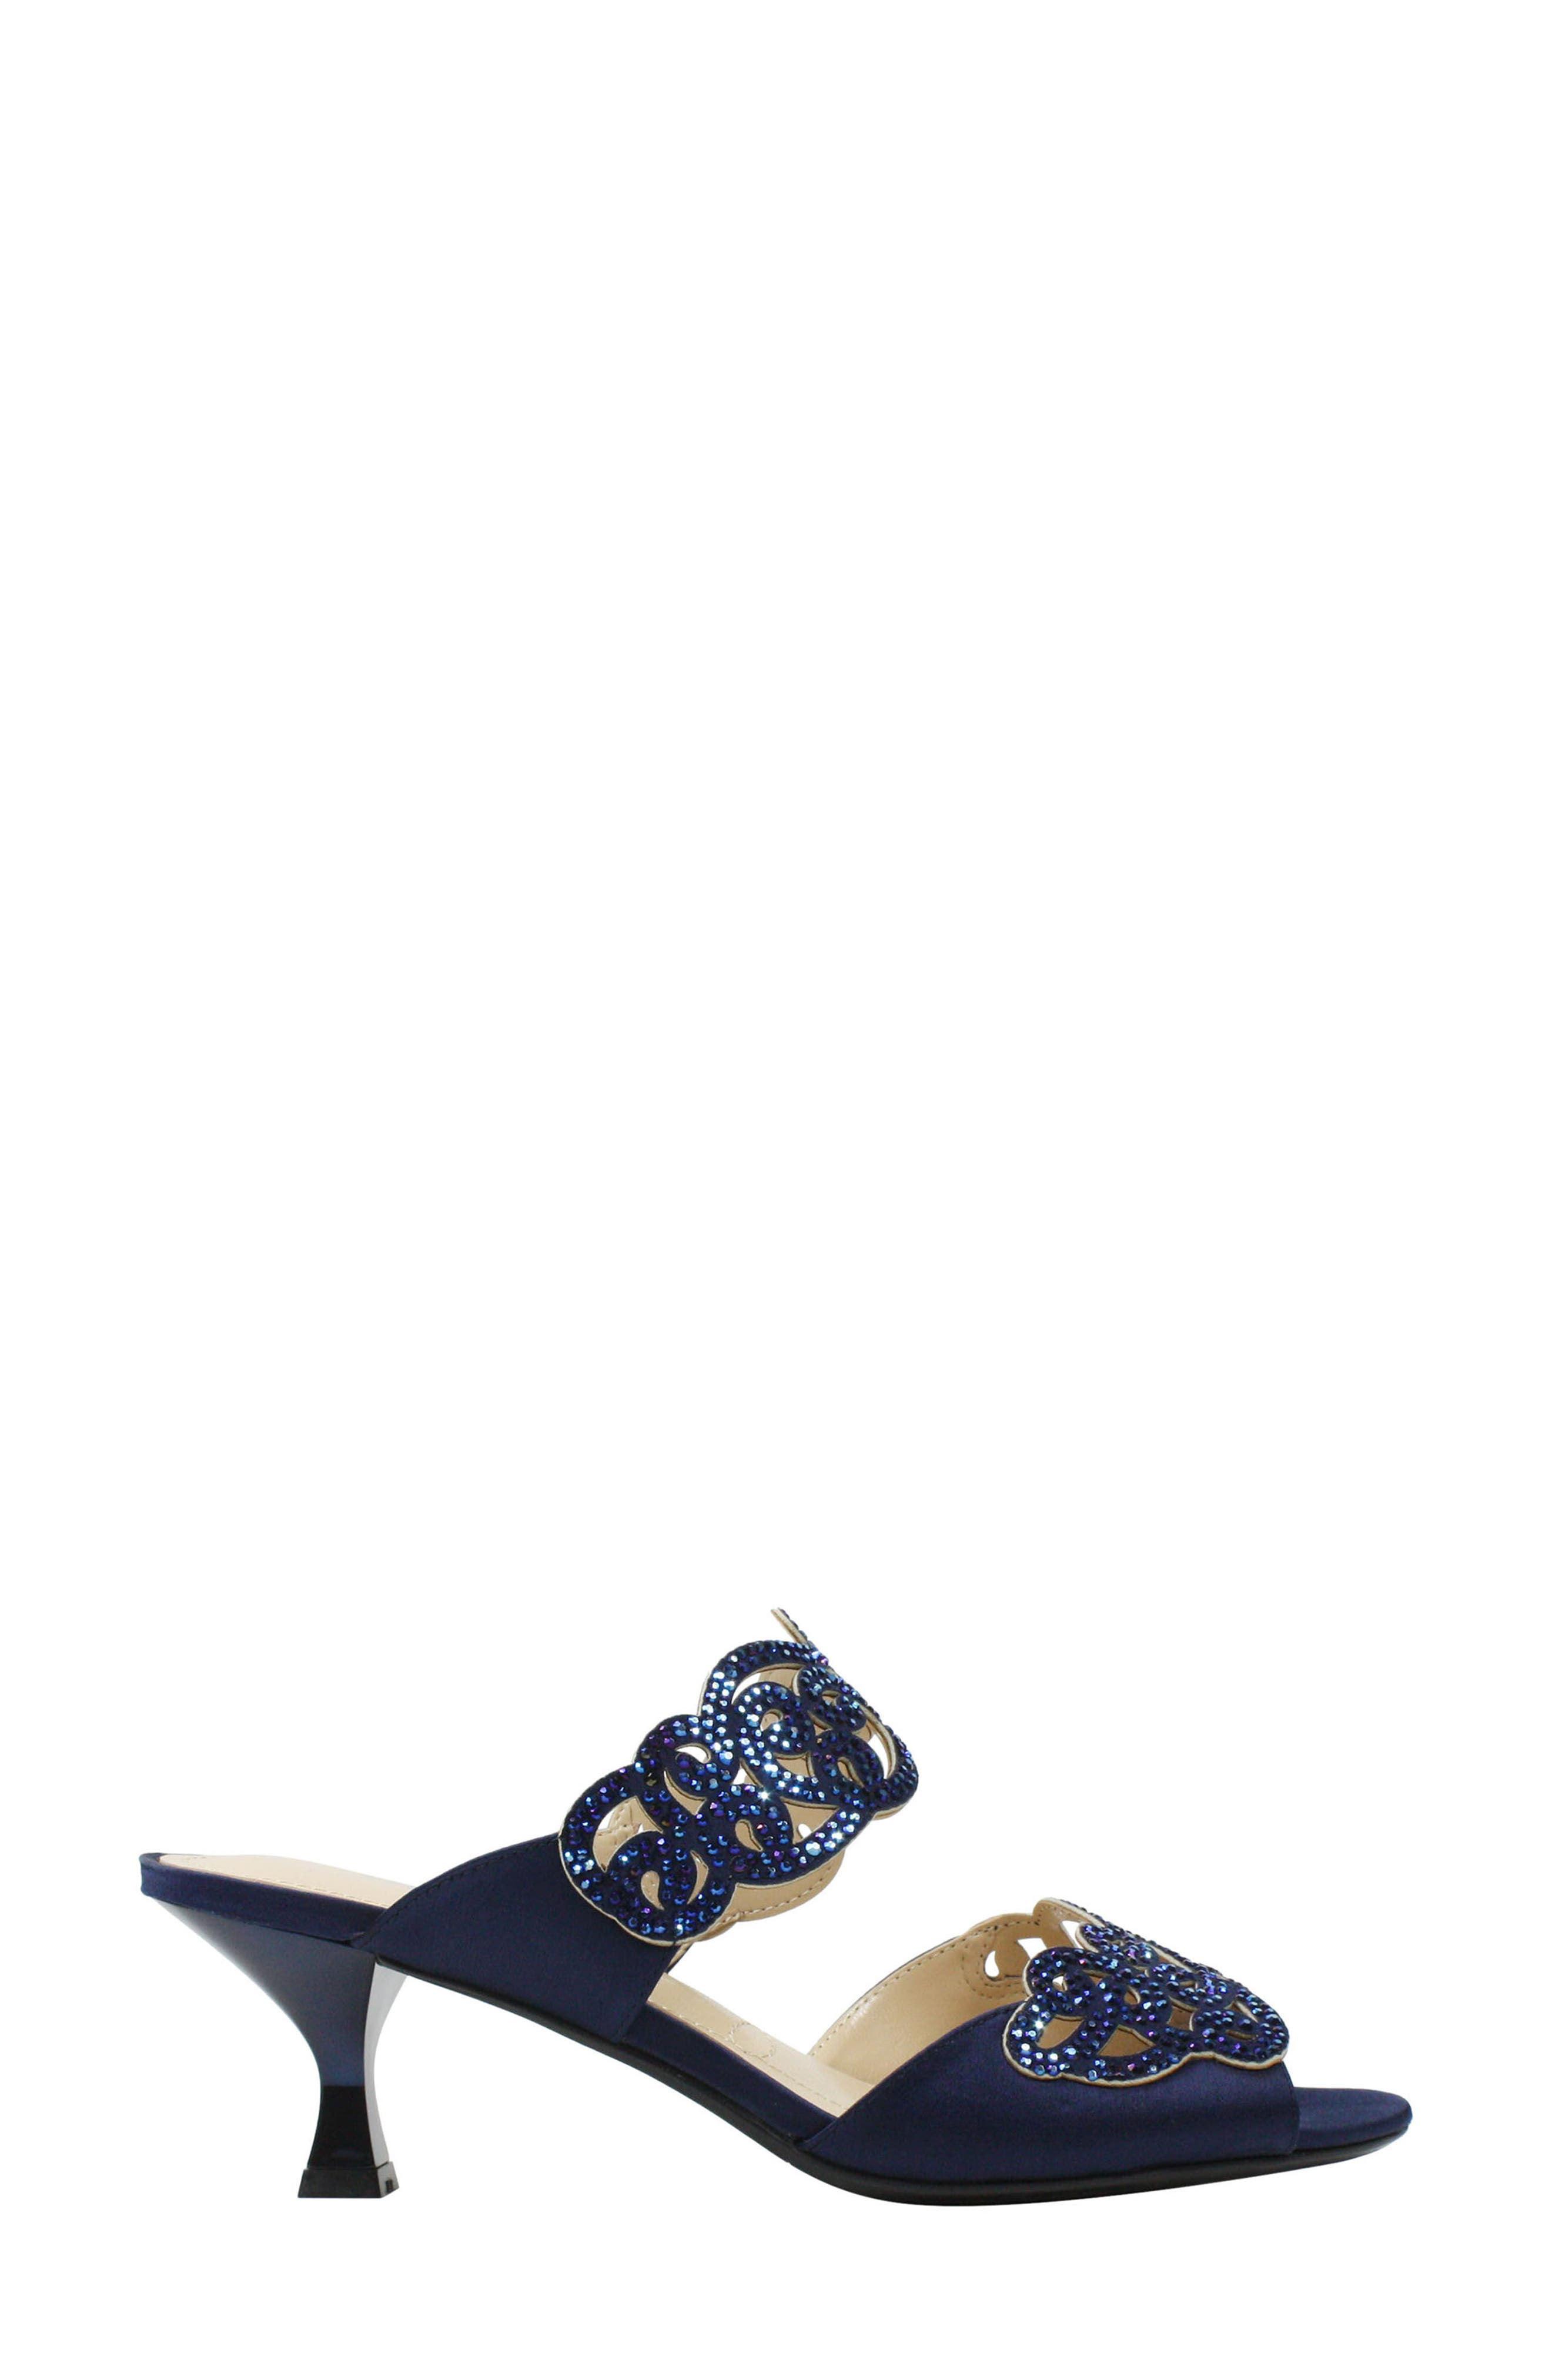 'Francie' Evening Sandal,                             Alternate thumbnail 3, color,                             Navy Fabric